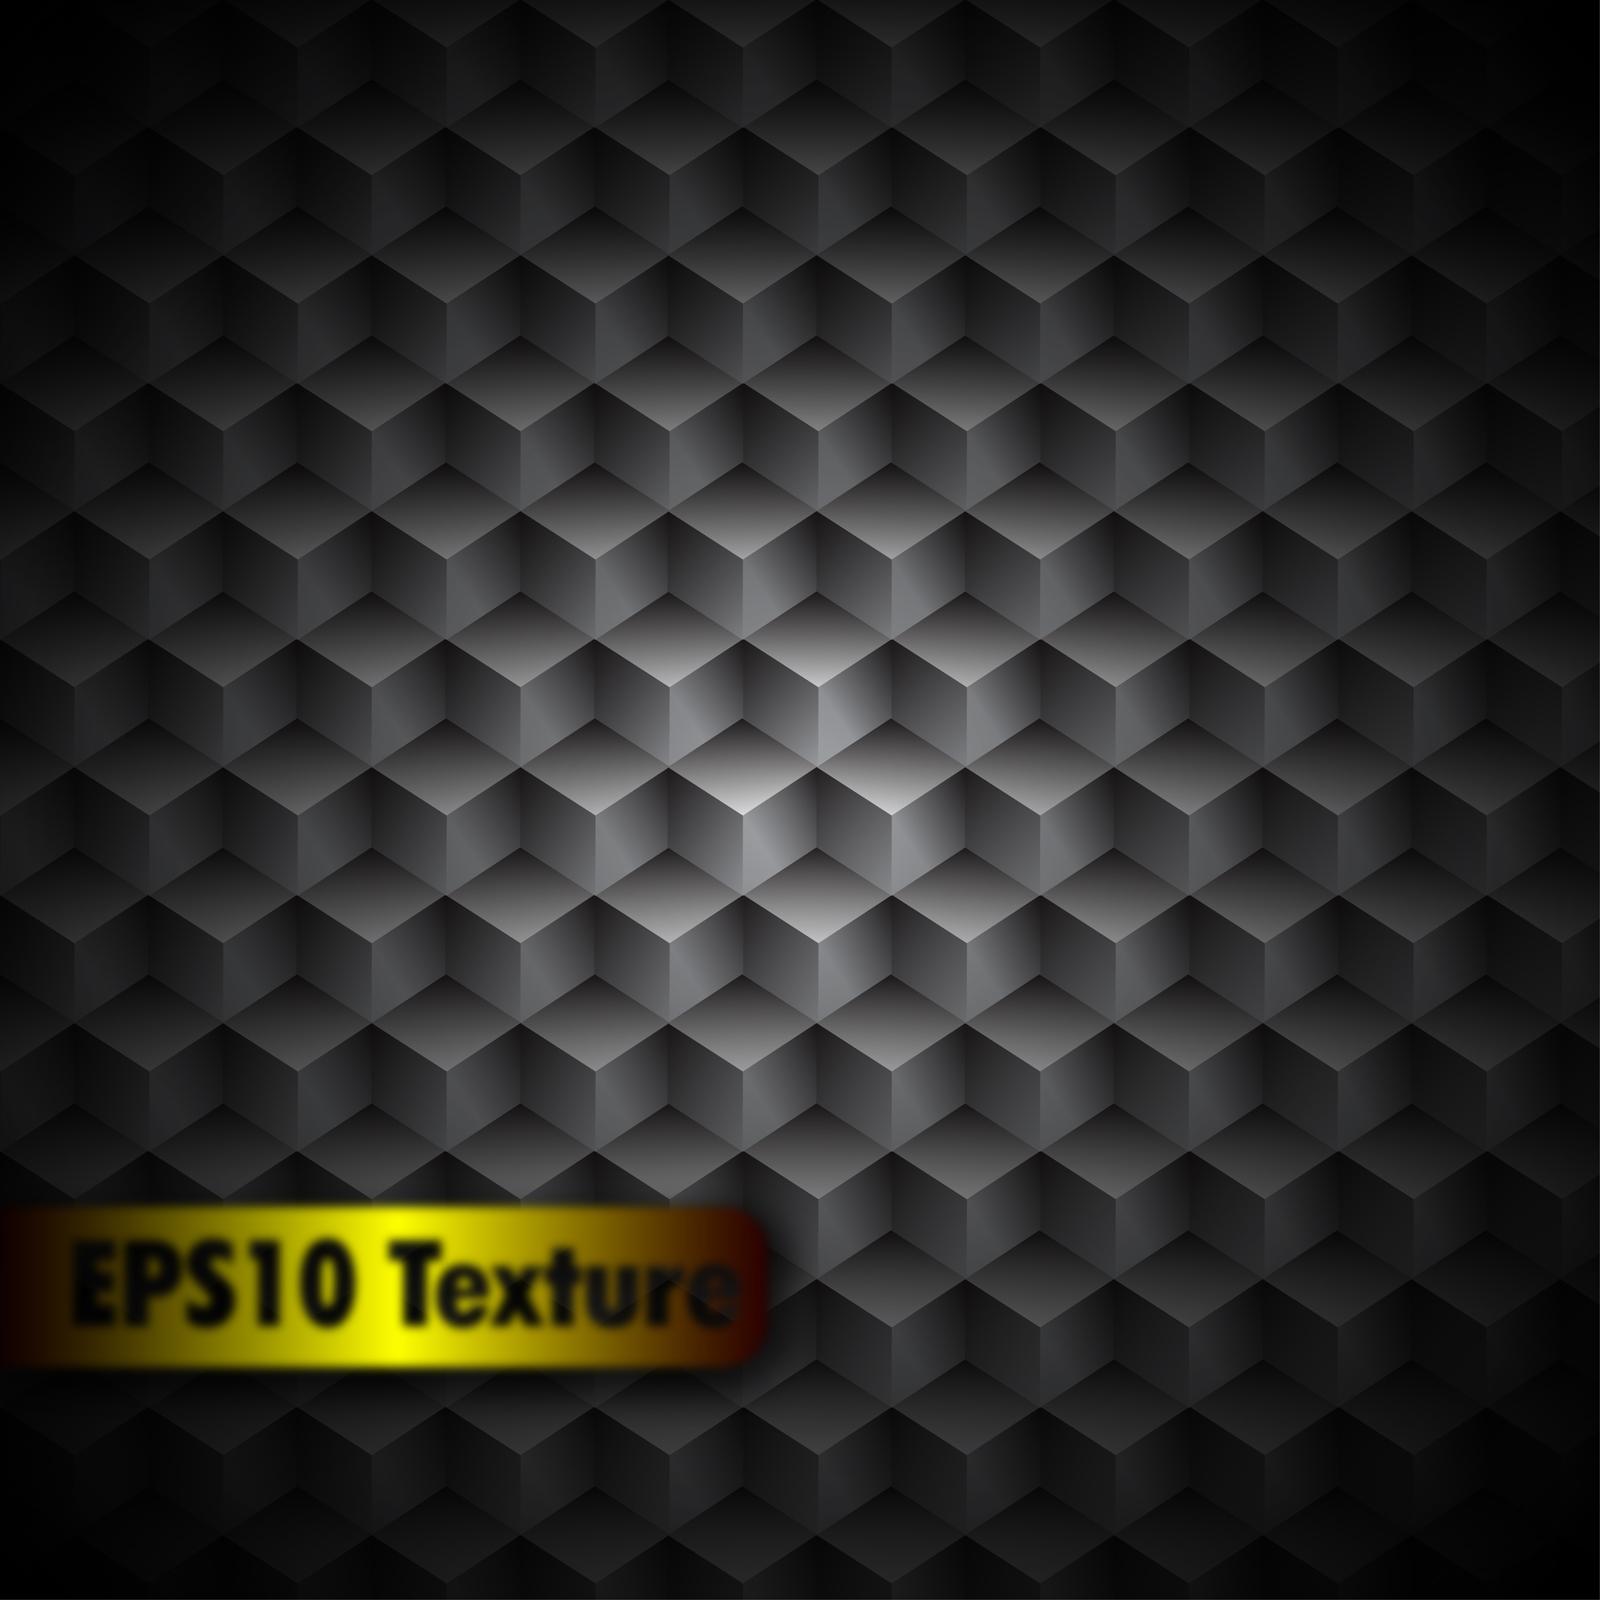 http://2.bp.blogspot.com/-MIIlif0bZ3s/T1Tvi23wb8I/AAAAAAAAAV0/BM63n-qYlBc/s1600/cubic-metal-texture.jpg